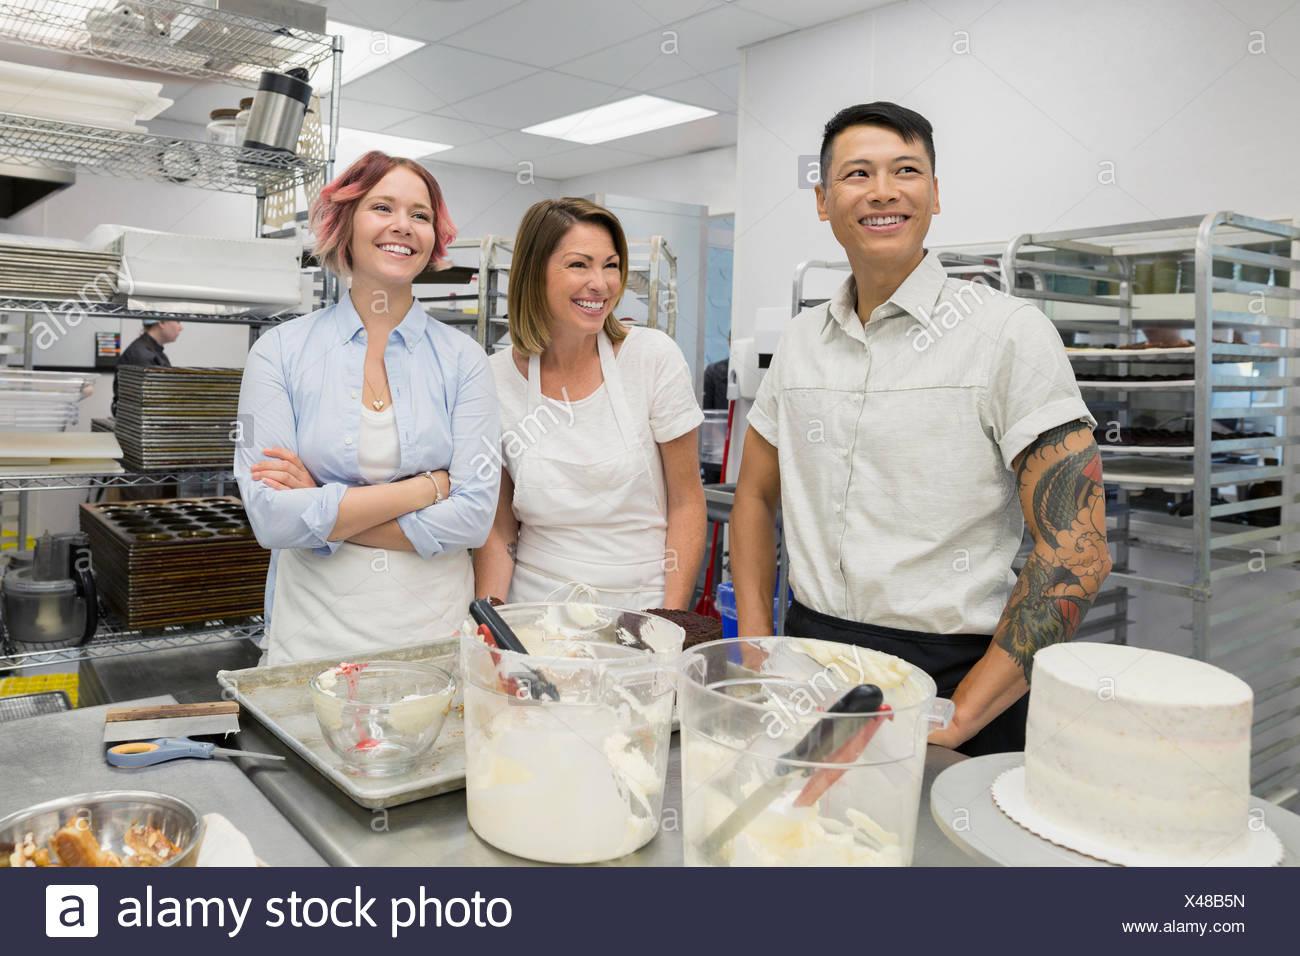 Laughing pasteleros en cocina comercial Imagen De Stock